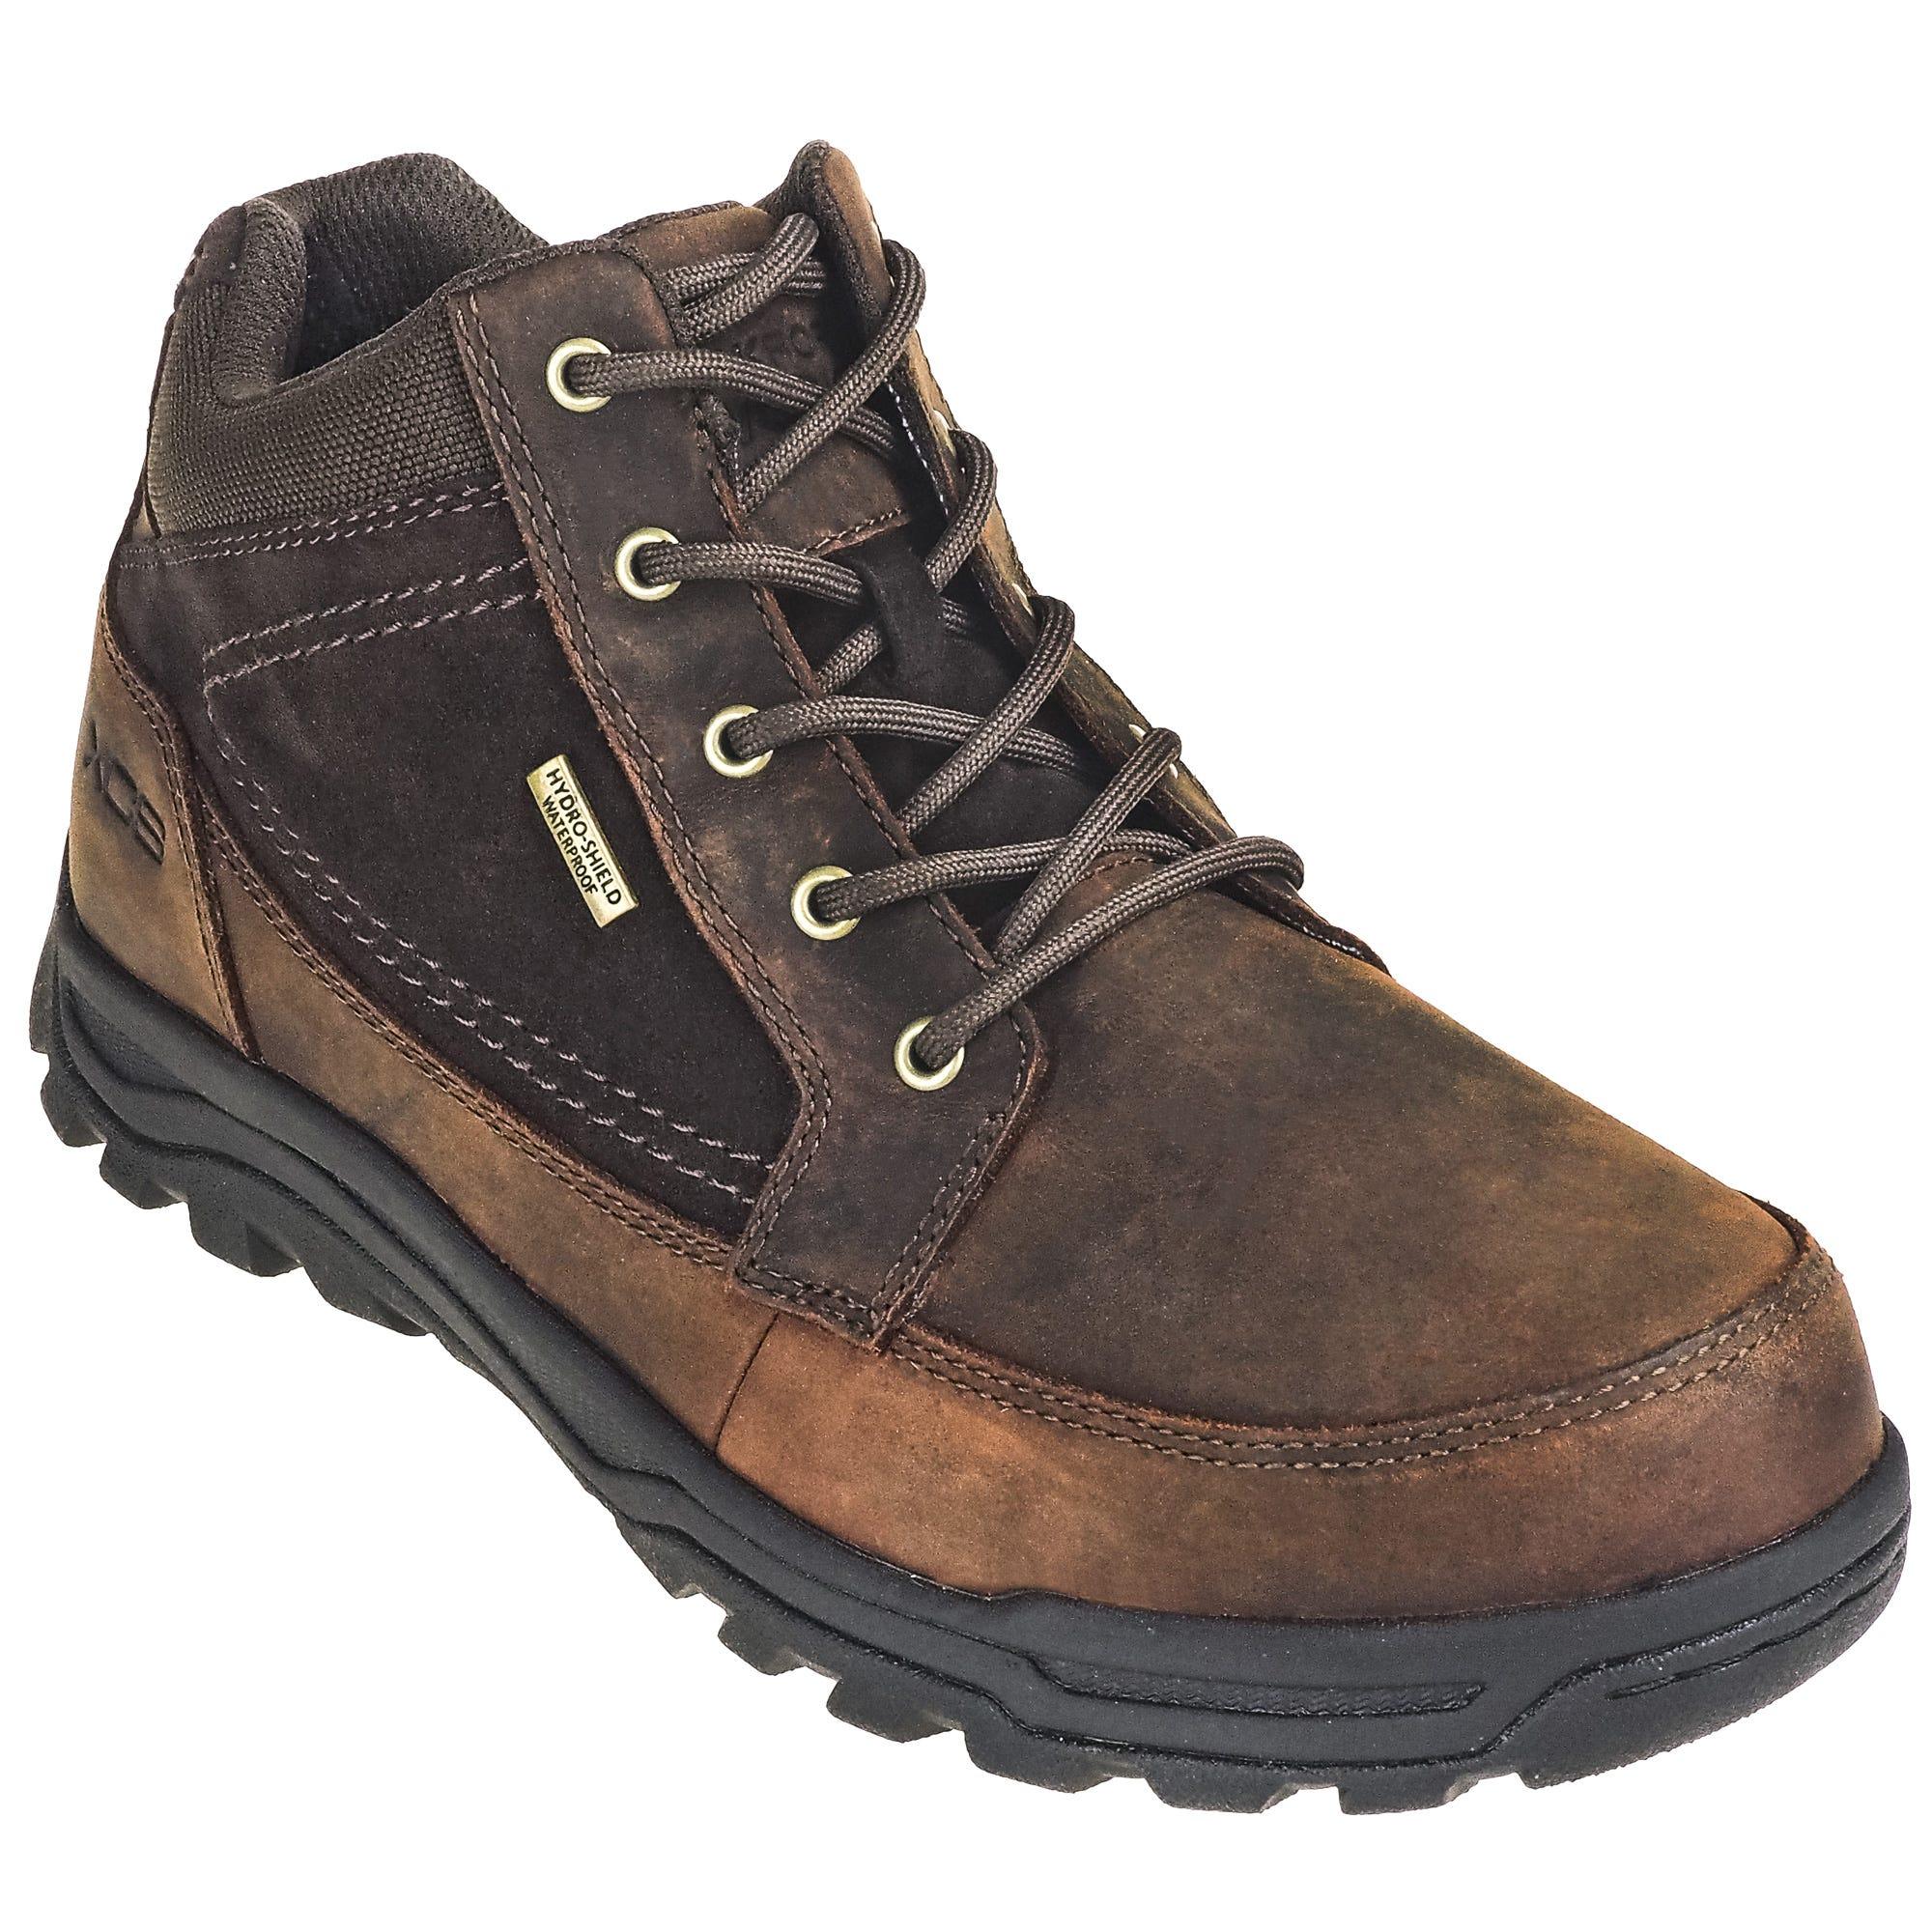 Rockport Works RK6671 Men's Trail Technique Steel Toe Hikers